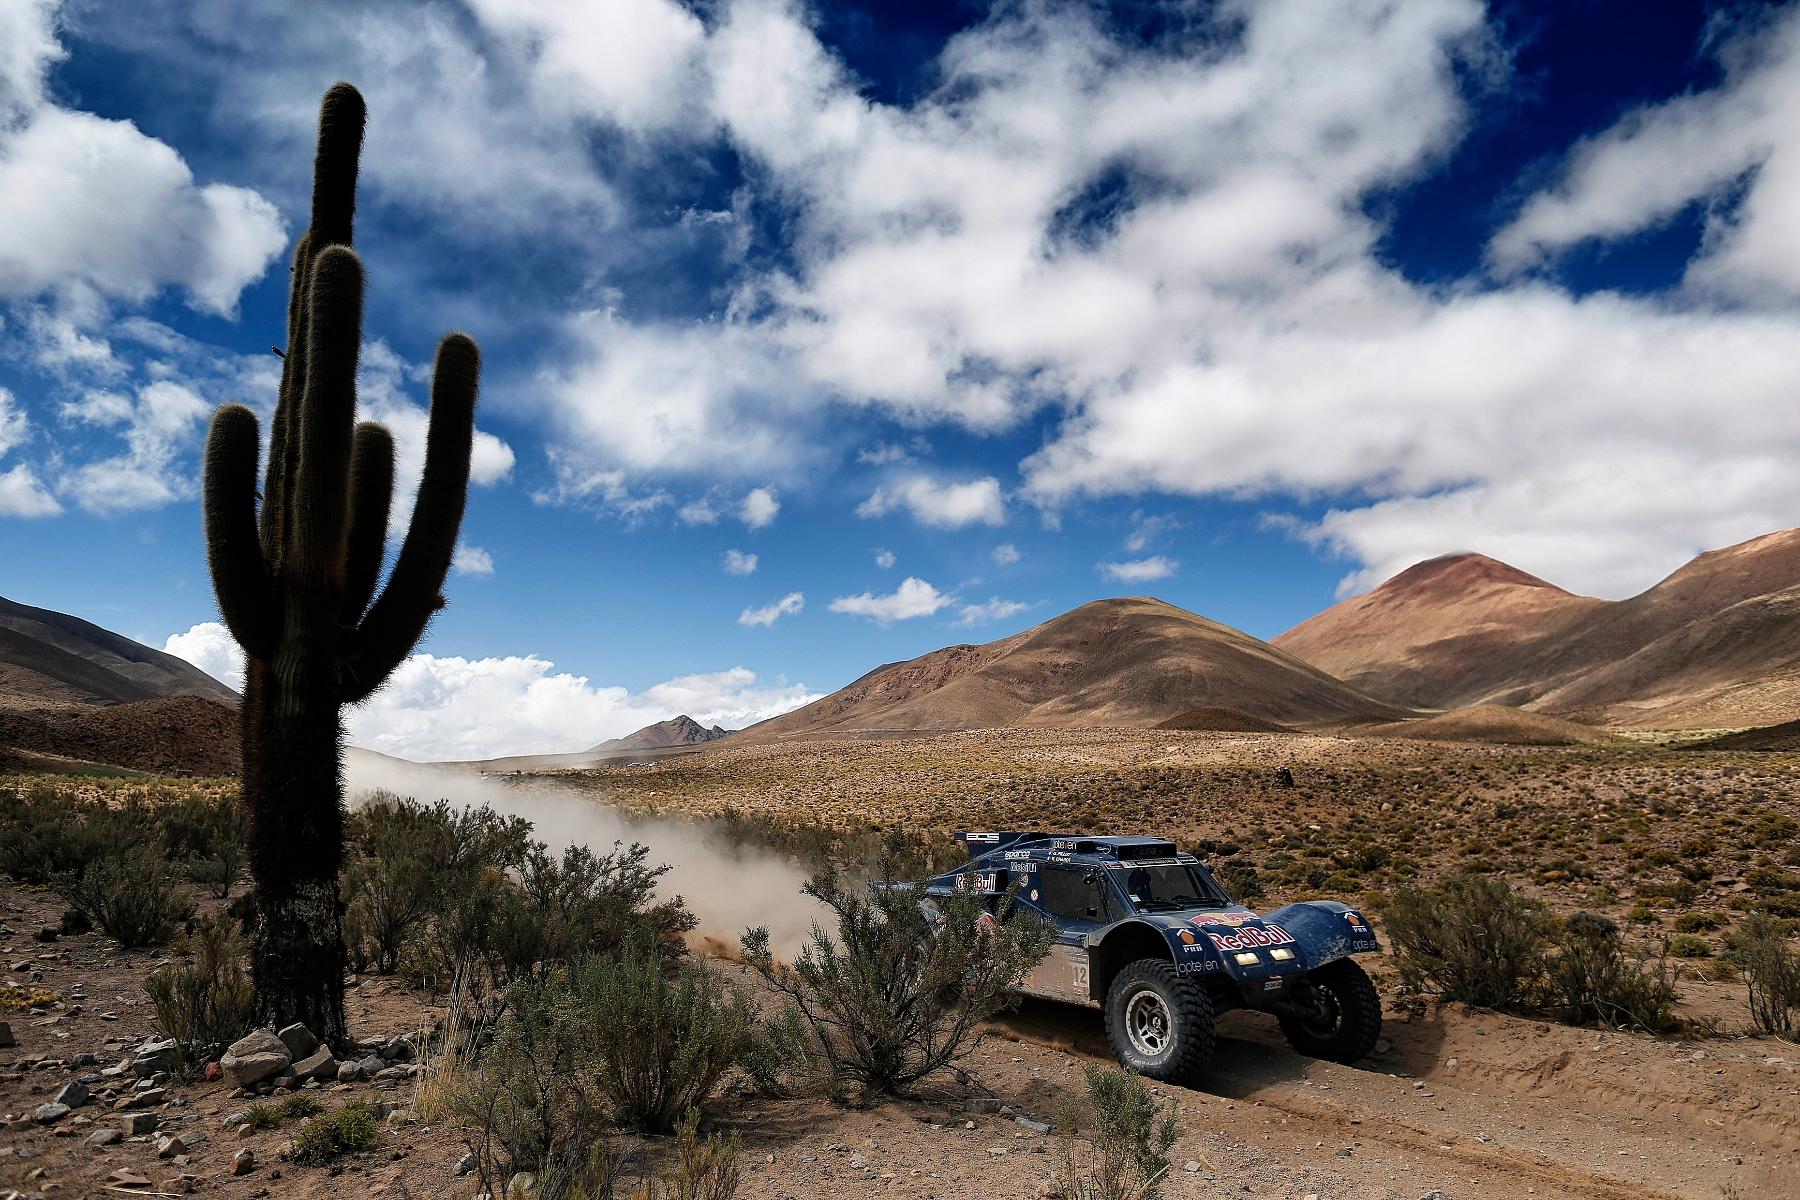 MOTORSPORT - DAKAR ARGENTINA BOLIVIA CHILE  2014 - STAGE 7 / ETAPE 7 -  SALTA (ARG) - SALTA (ARG) - PHOTO FRANCOIS FLAMAND / DPPI - 312CHABOT RONAN (FRA) / PILLOT GILLES - SMG - ACTION